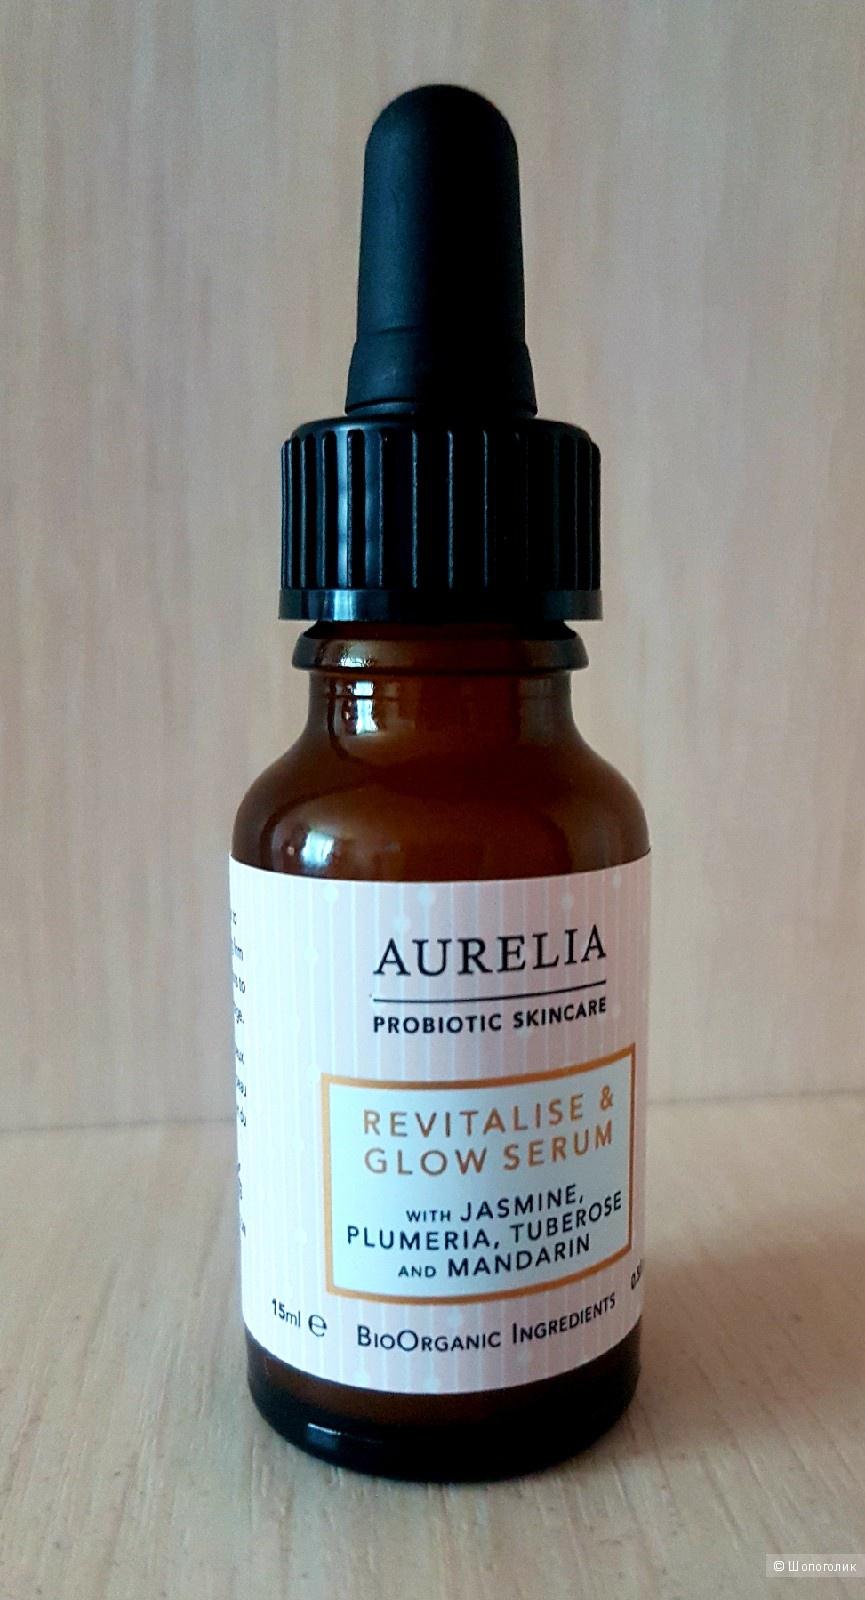 Сыворотка для лица AURELIA Revitalise & Glow Serum 15 ml